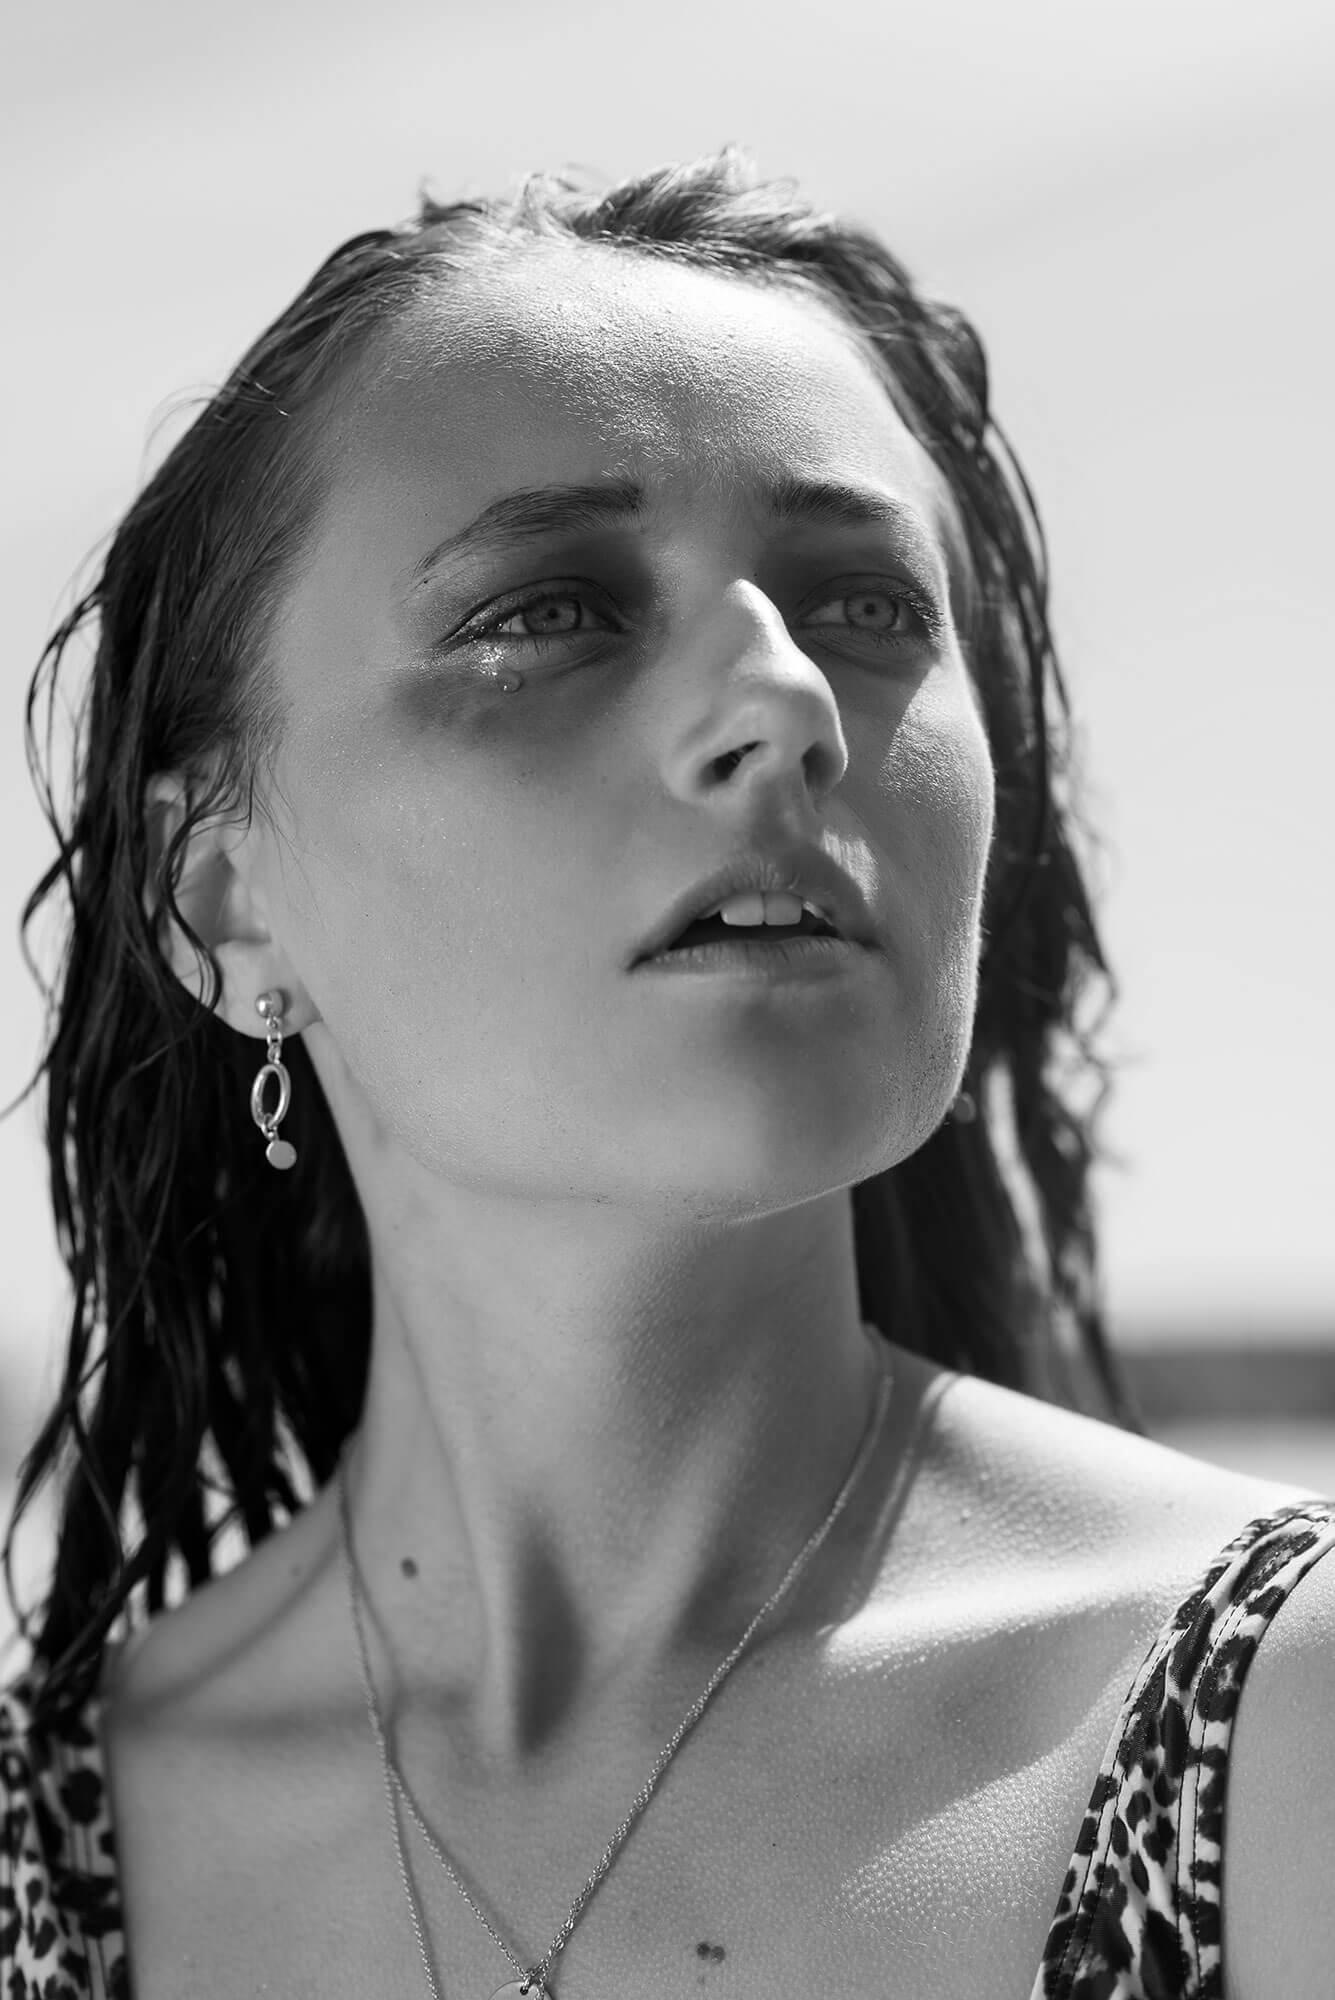 Close up portret model sieraden strand zwart wit